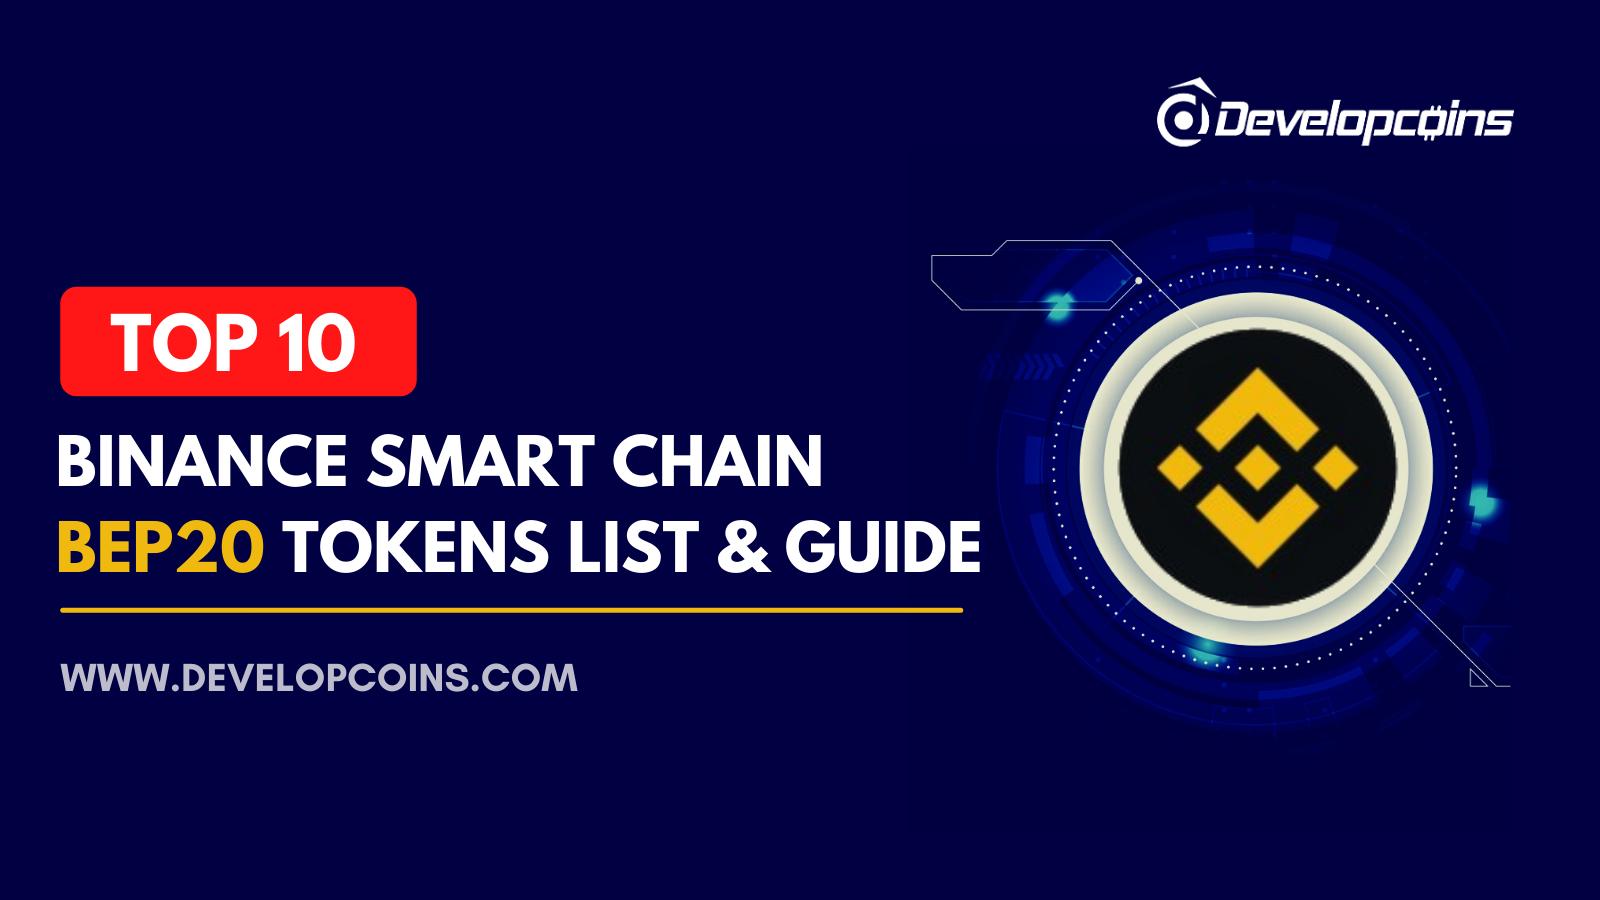 Top 10 Binance Smart Chain BEP20 Tokens List & Guide